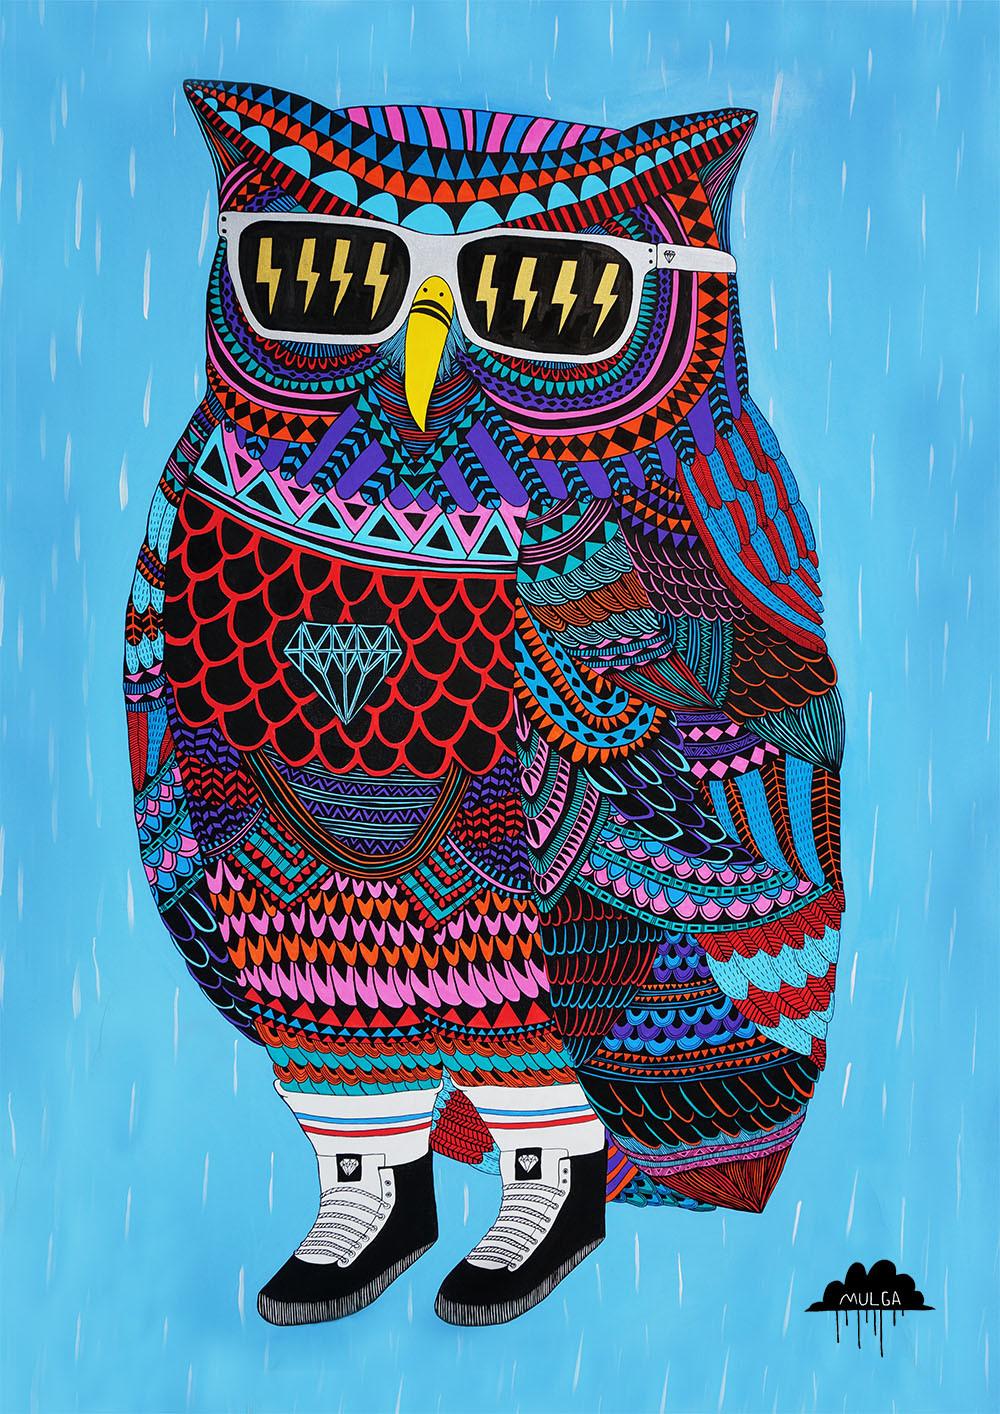 otis the owl by mulga the artist -1000 px wide 300dpi - Copy.jpg